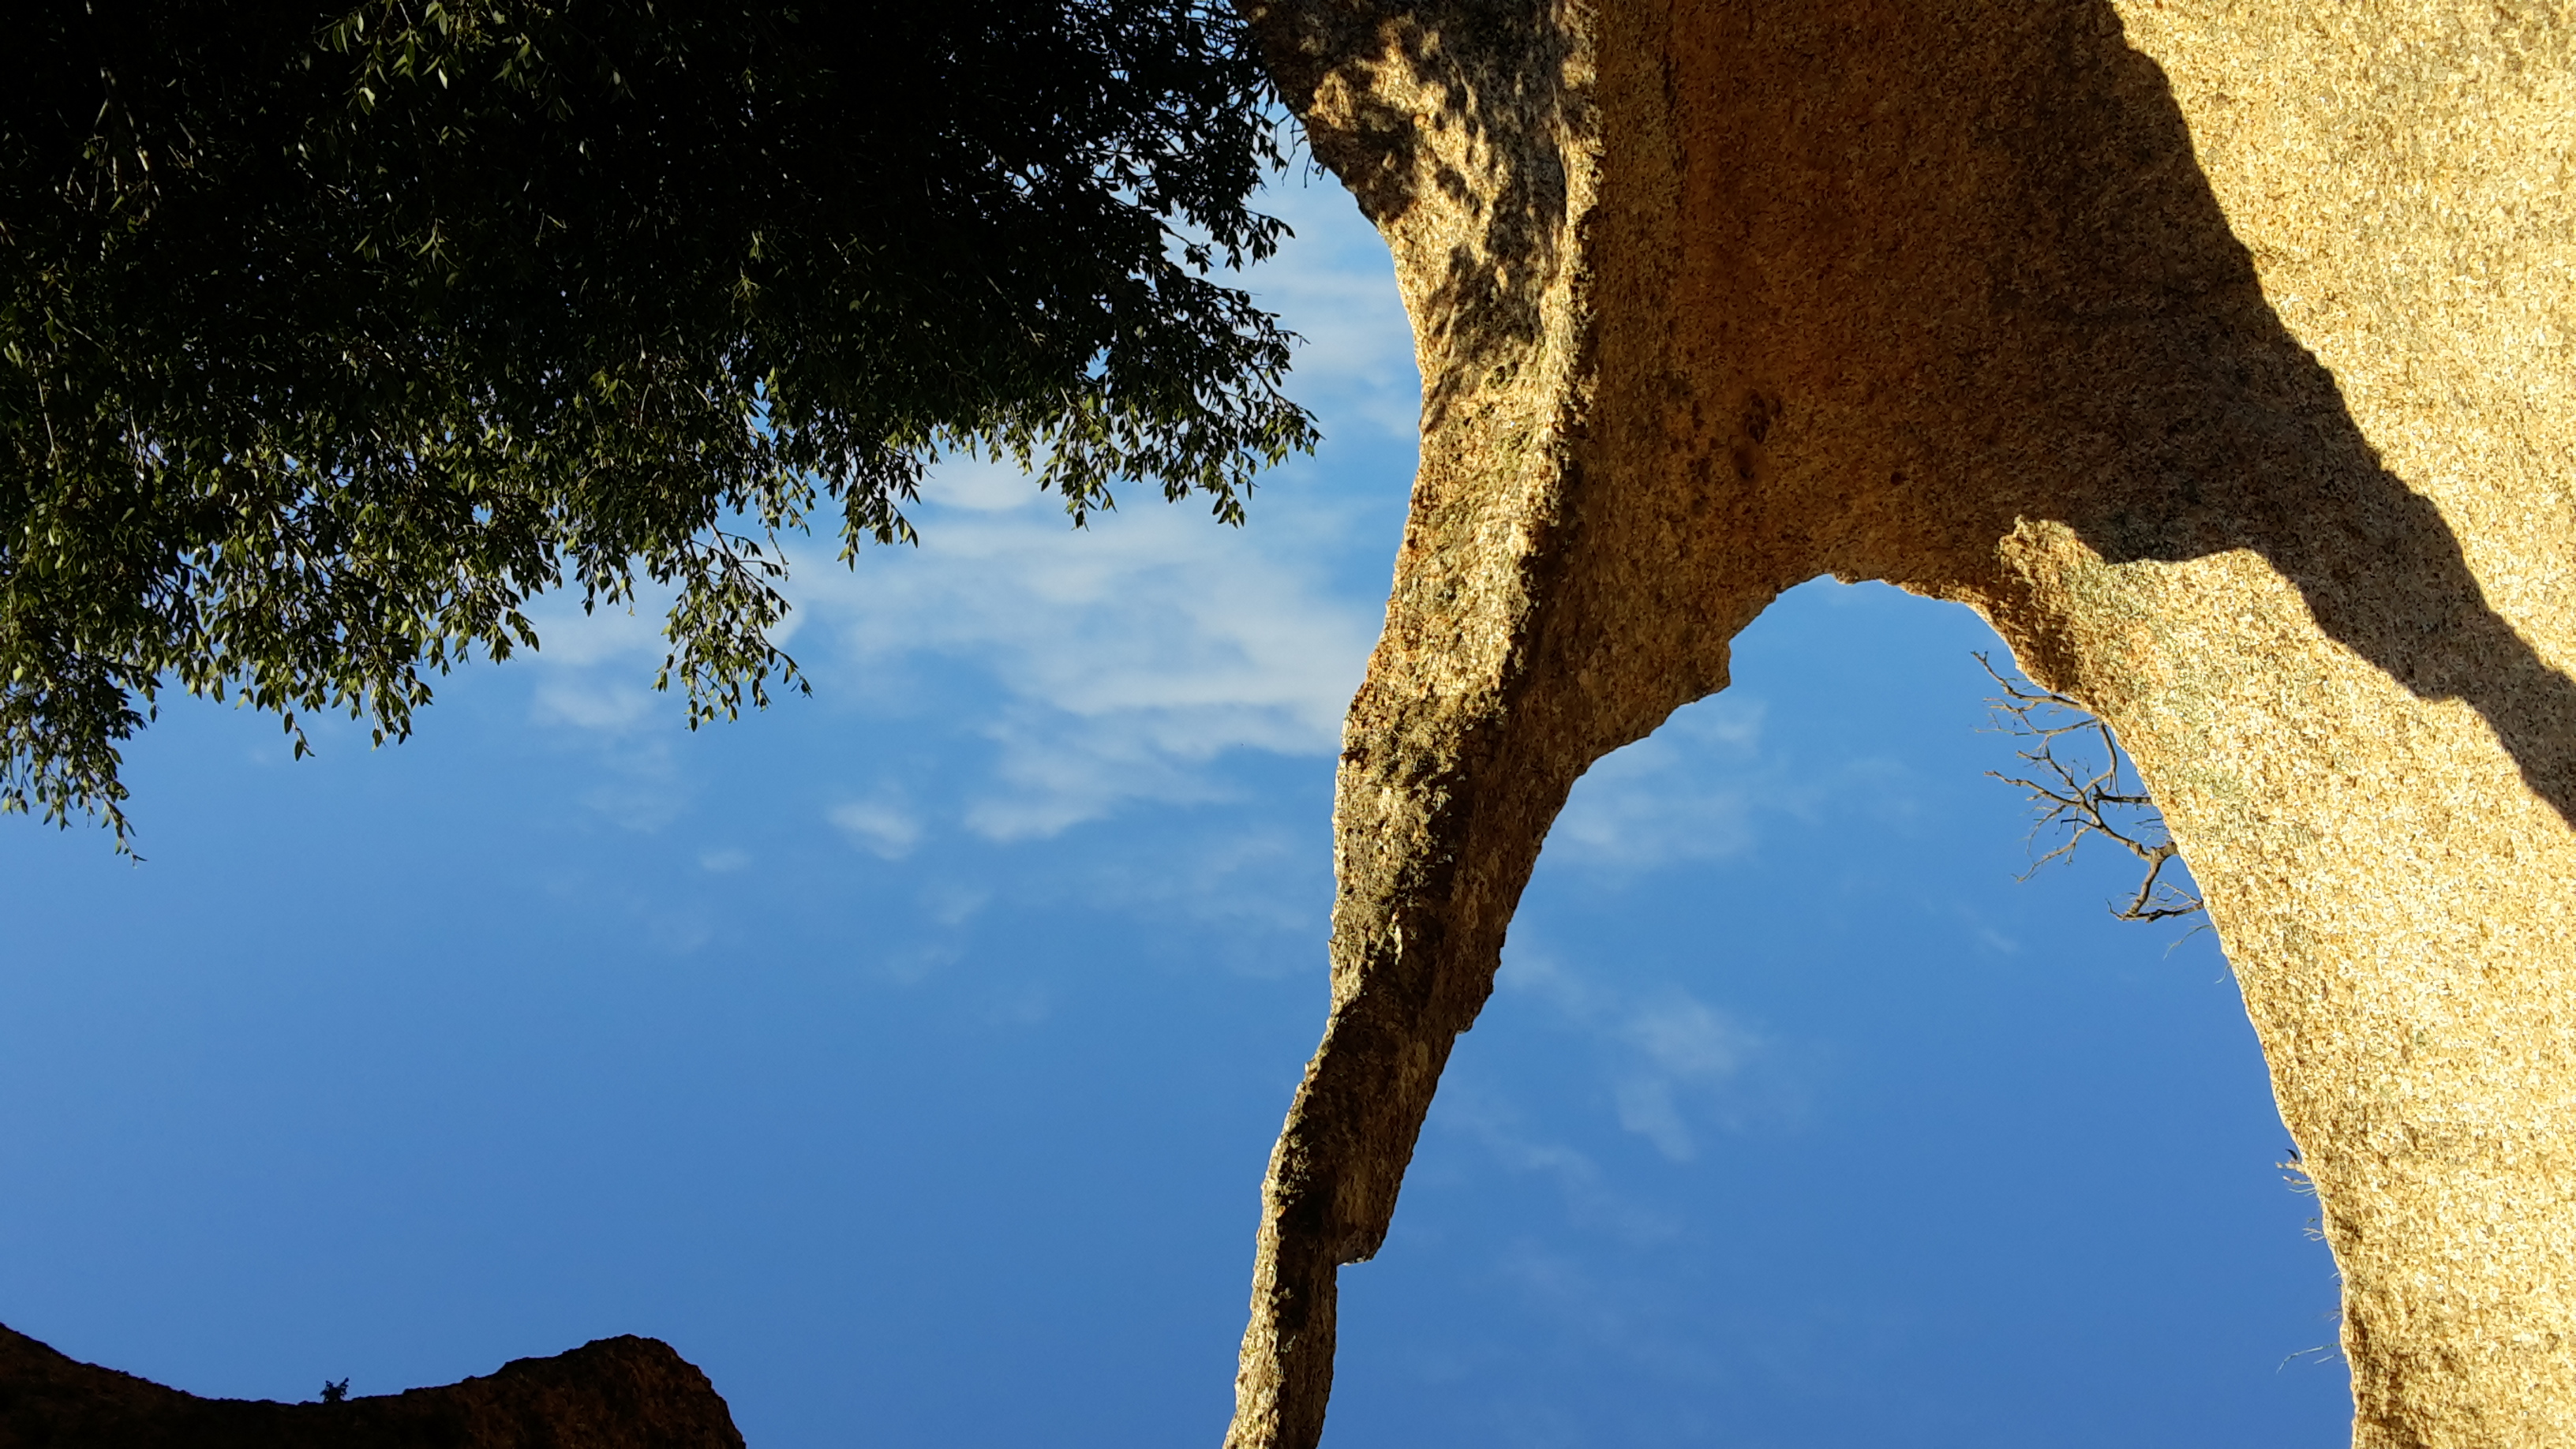 Ferienhaus mieten auf Korsika